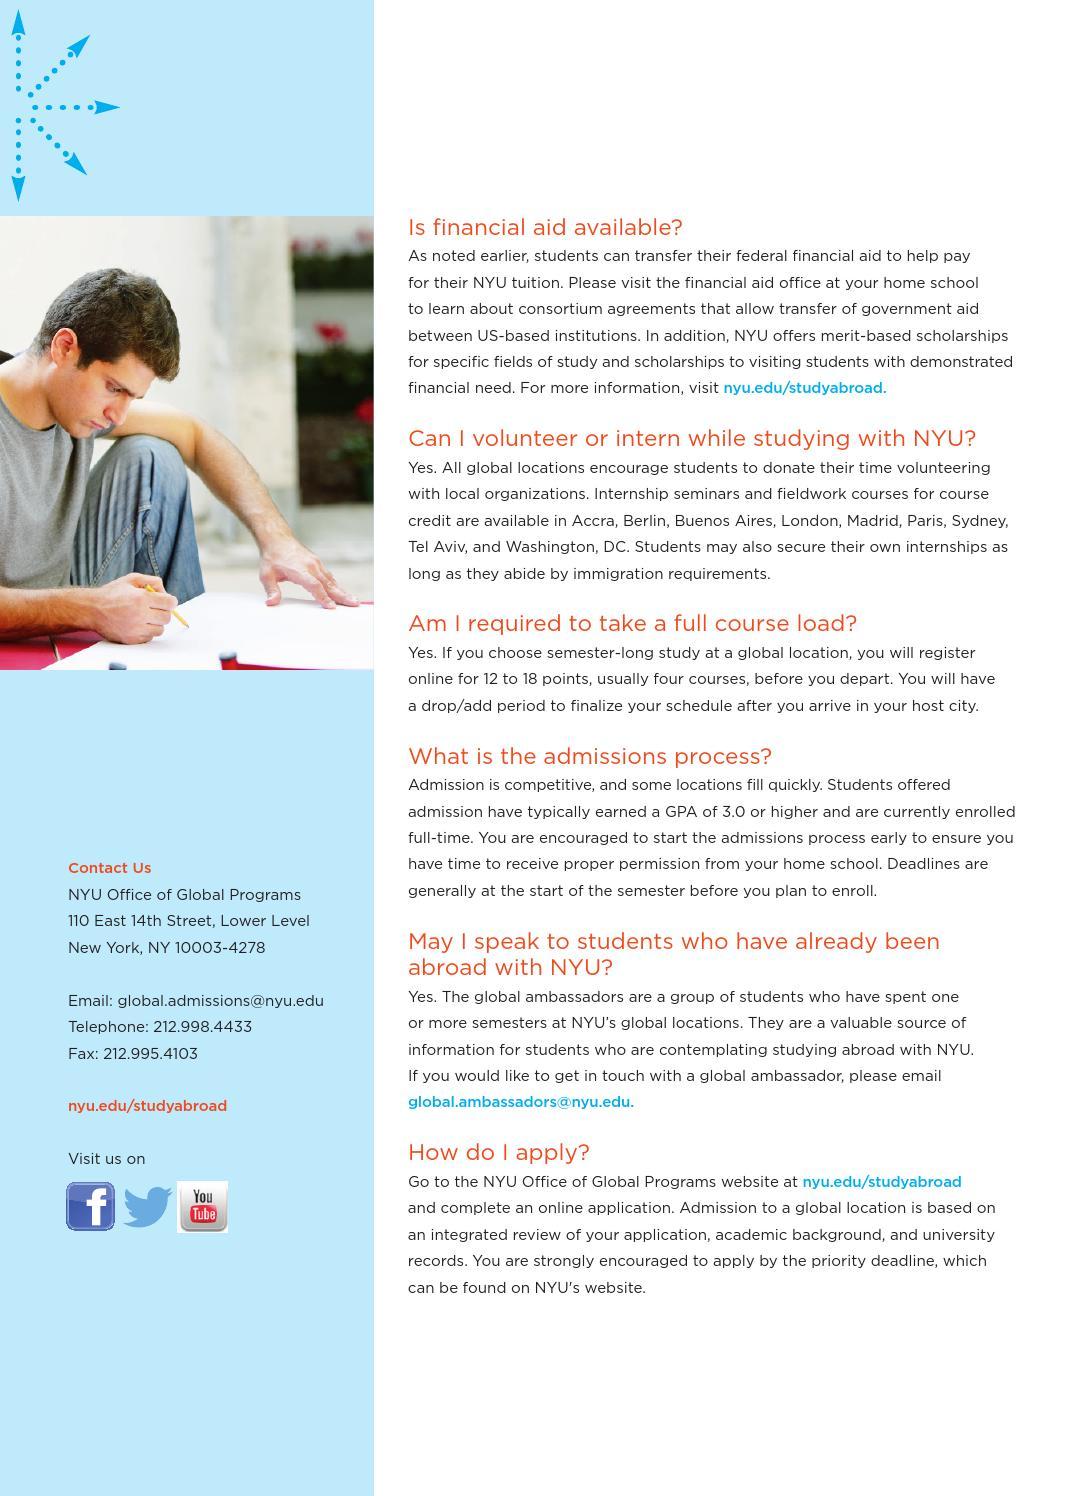 NYU Global Programs General Brochure by New York University